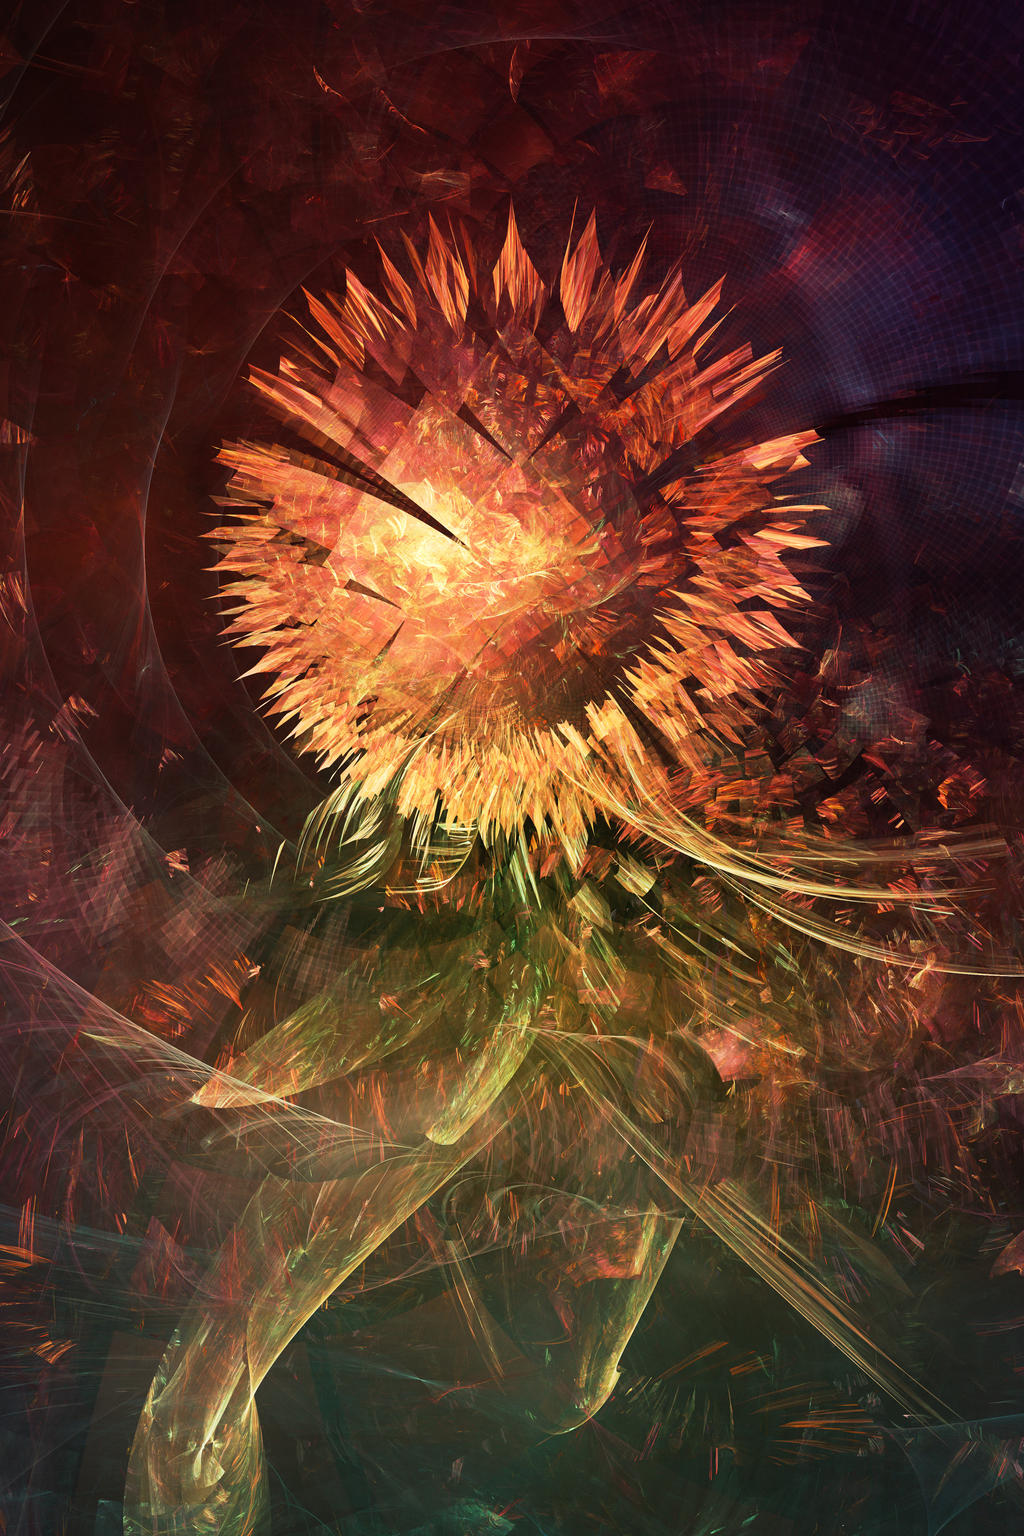 Sunflower by Naviretlav